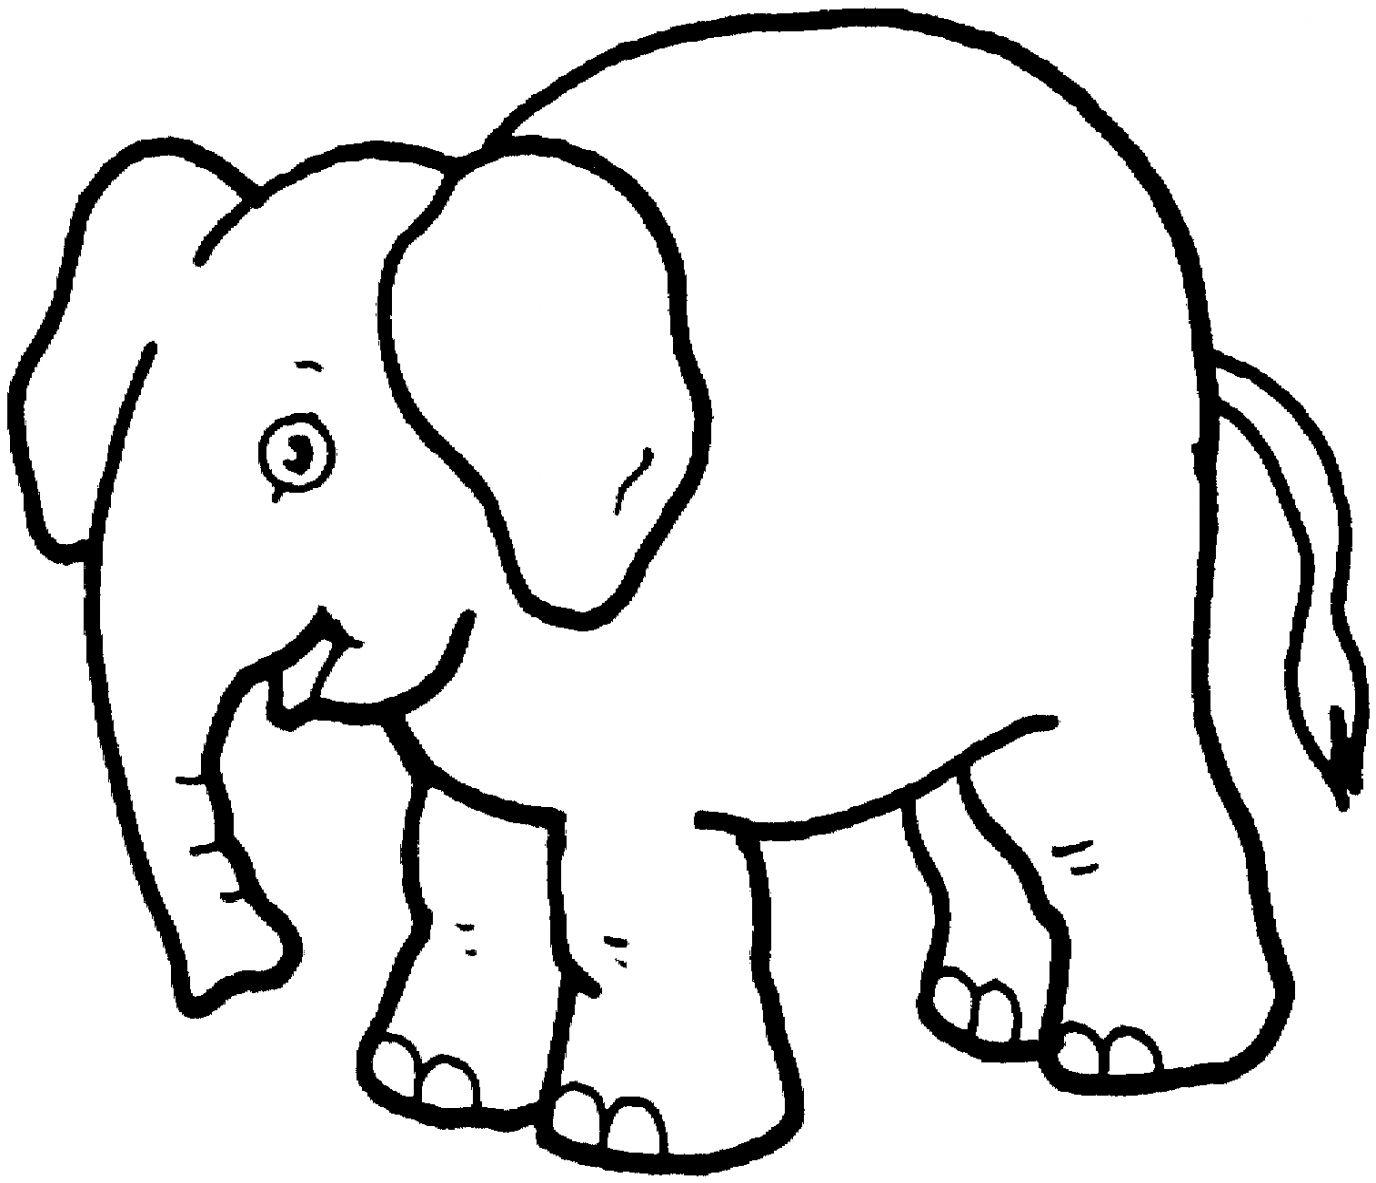 Elephant black and white clipart jpg Elephant Black And White Clipart | Wallpapers Warrior jpg